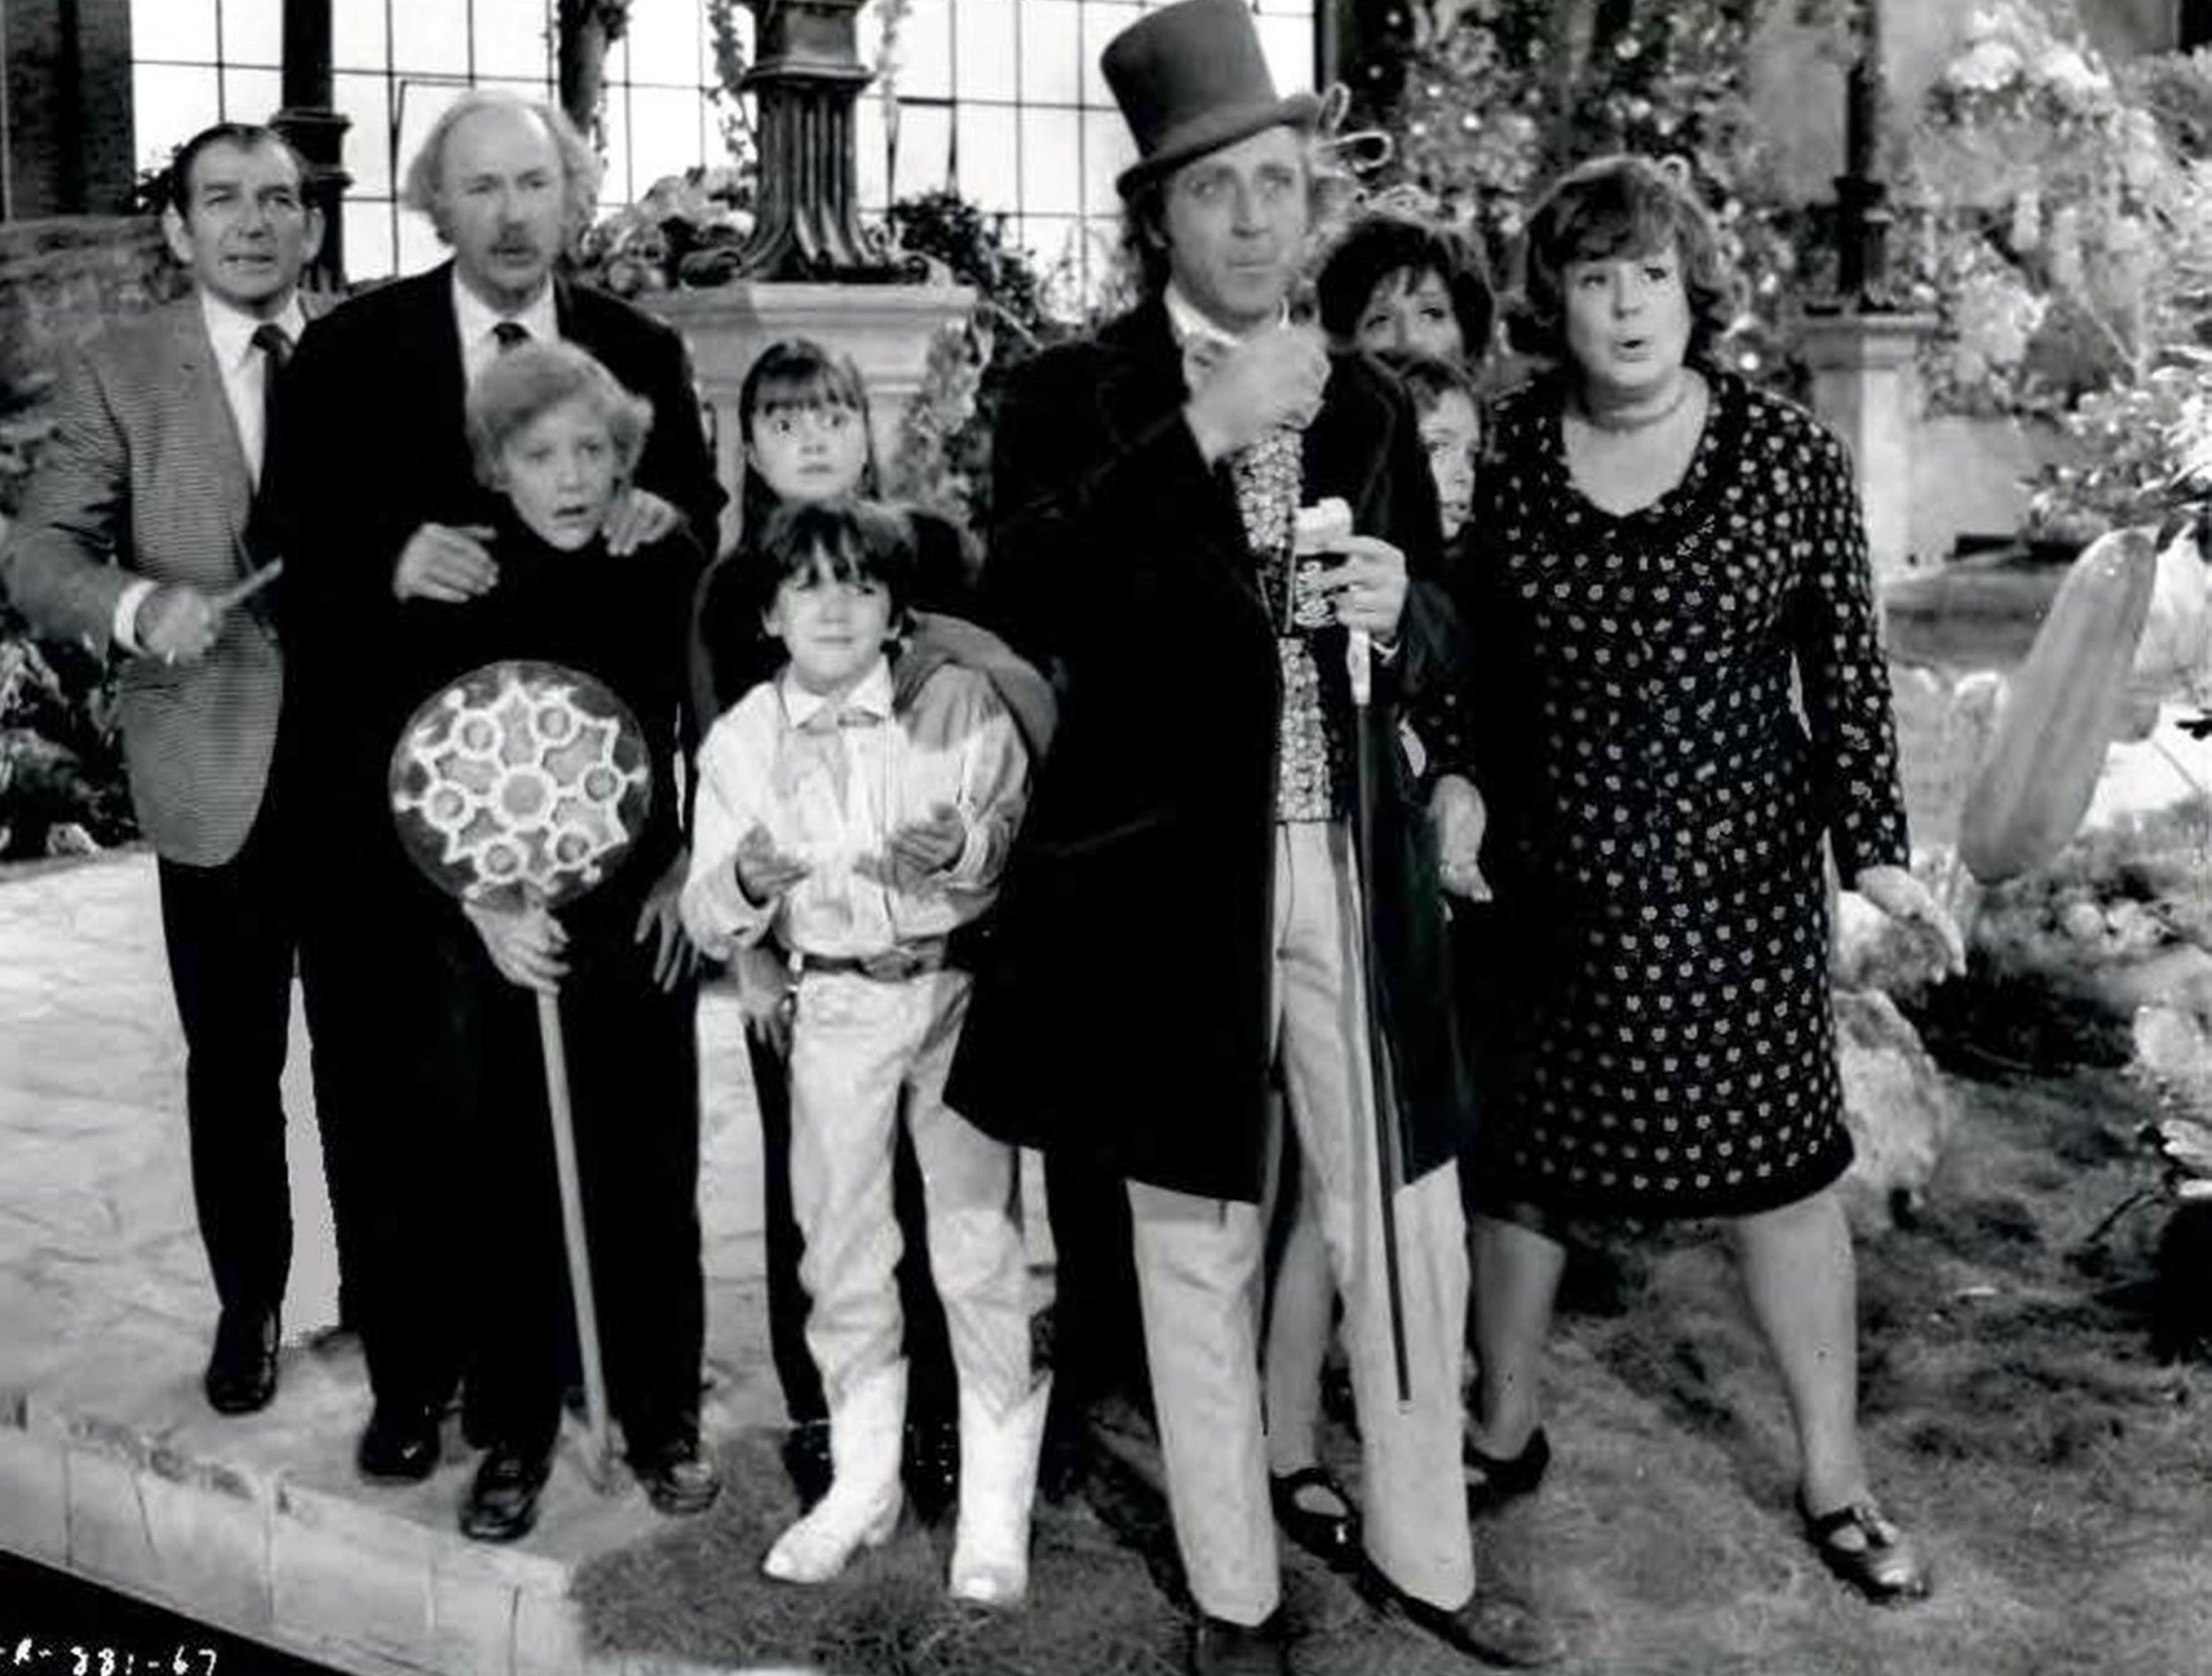 12-17-14 Willy Wonka